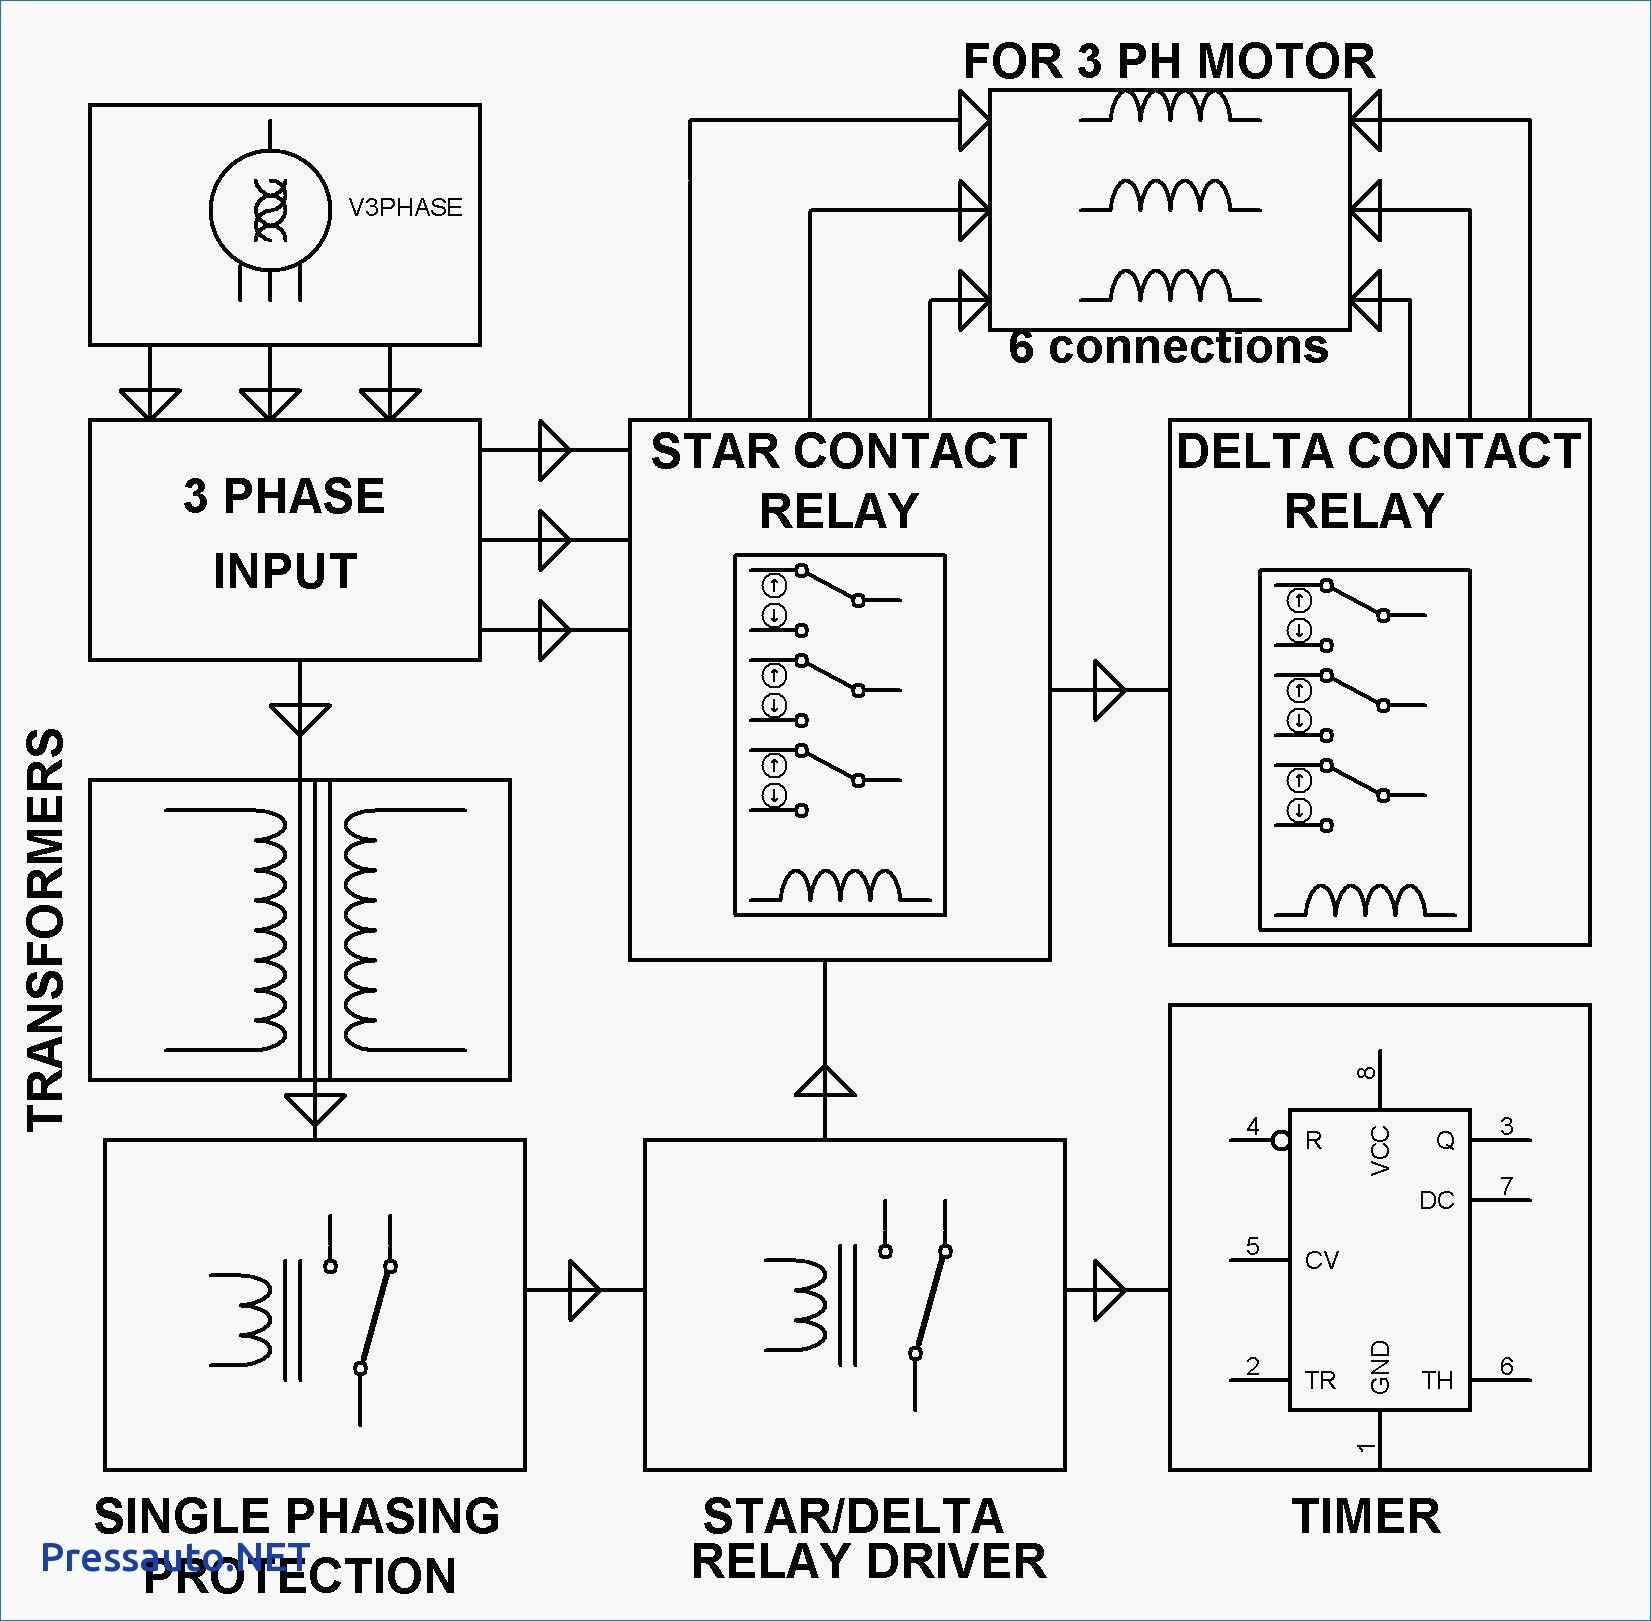 3 Phase 240v Motor Wiring Diagram Motor Electronics Basics Electrical Projects